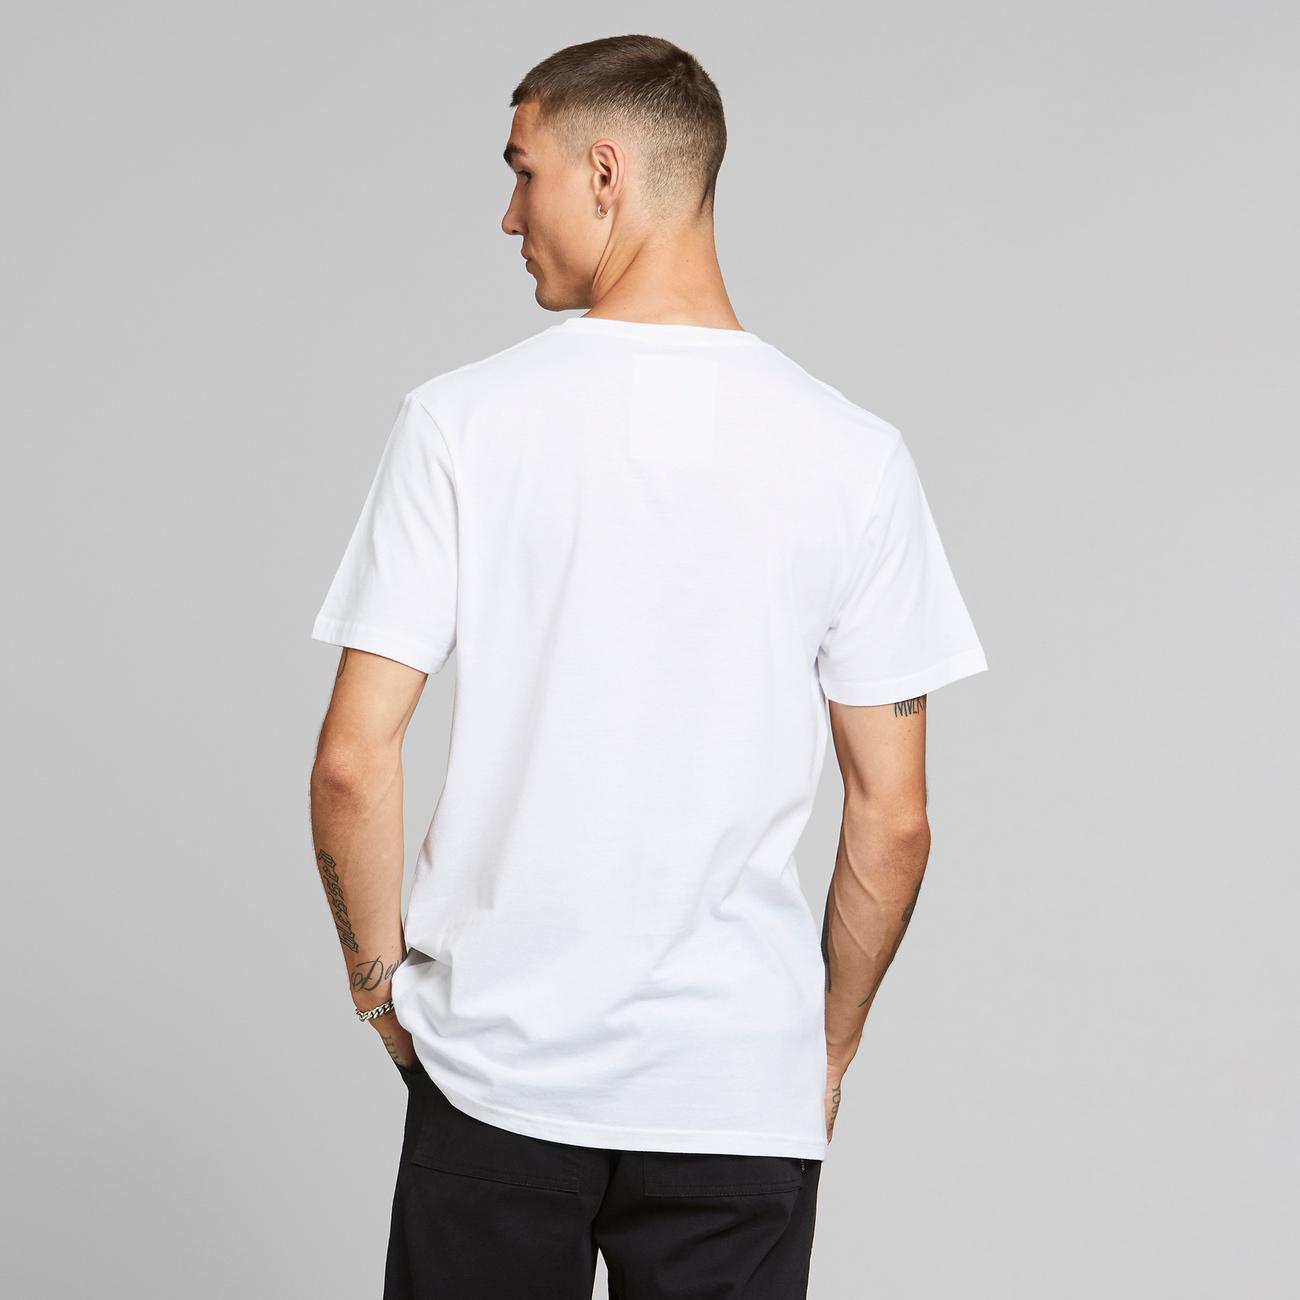 T-shirt Stockholm Not Bananas White